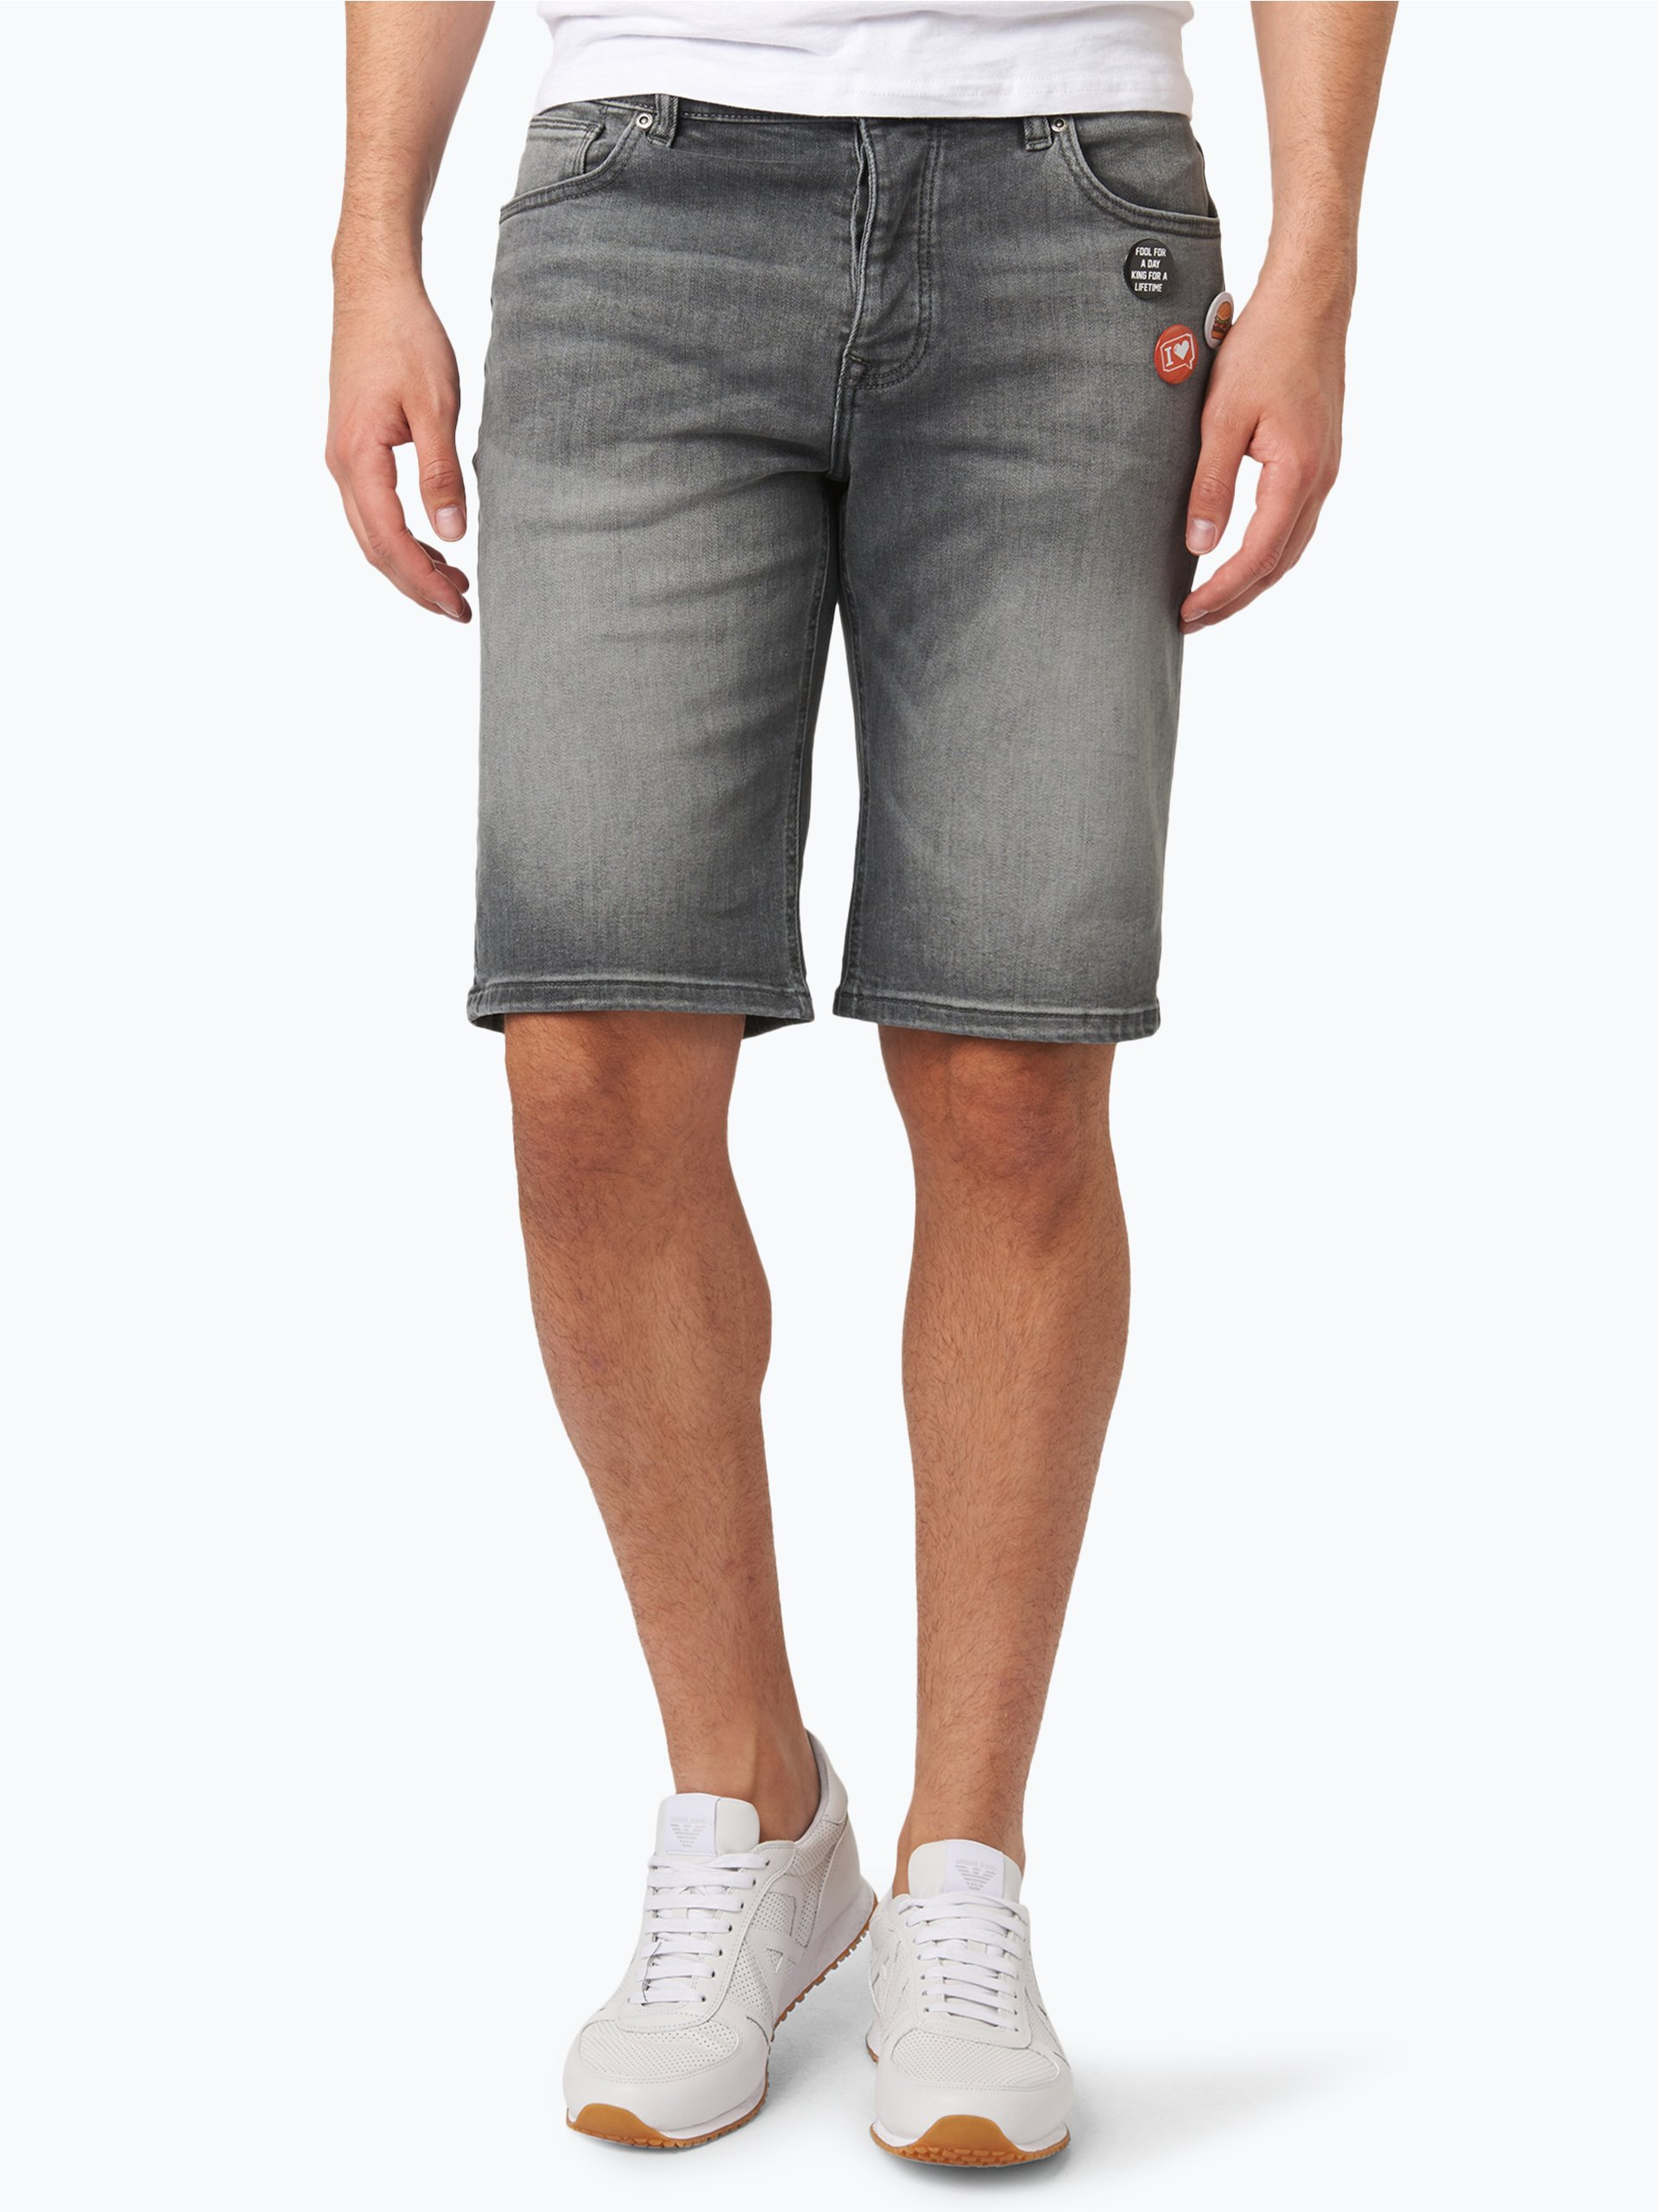 review herren jeans bermuda grau uni online kaufen peek und cloppenburg de. Black Bedroom Furniture Sets. Home Design Ideas